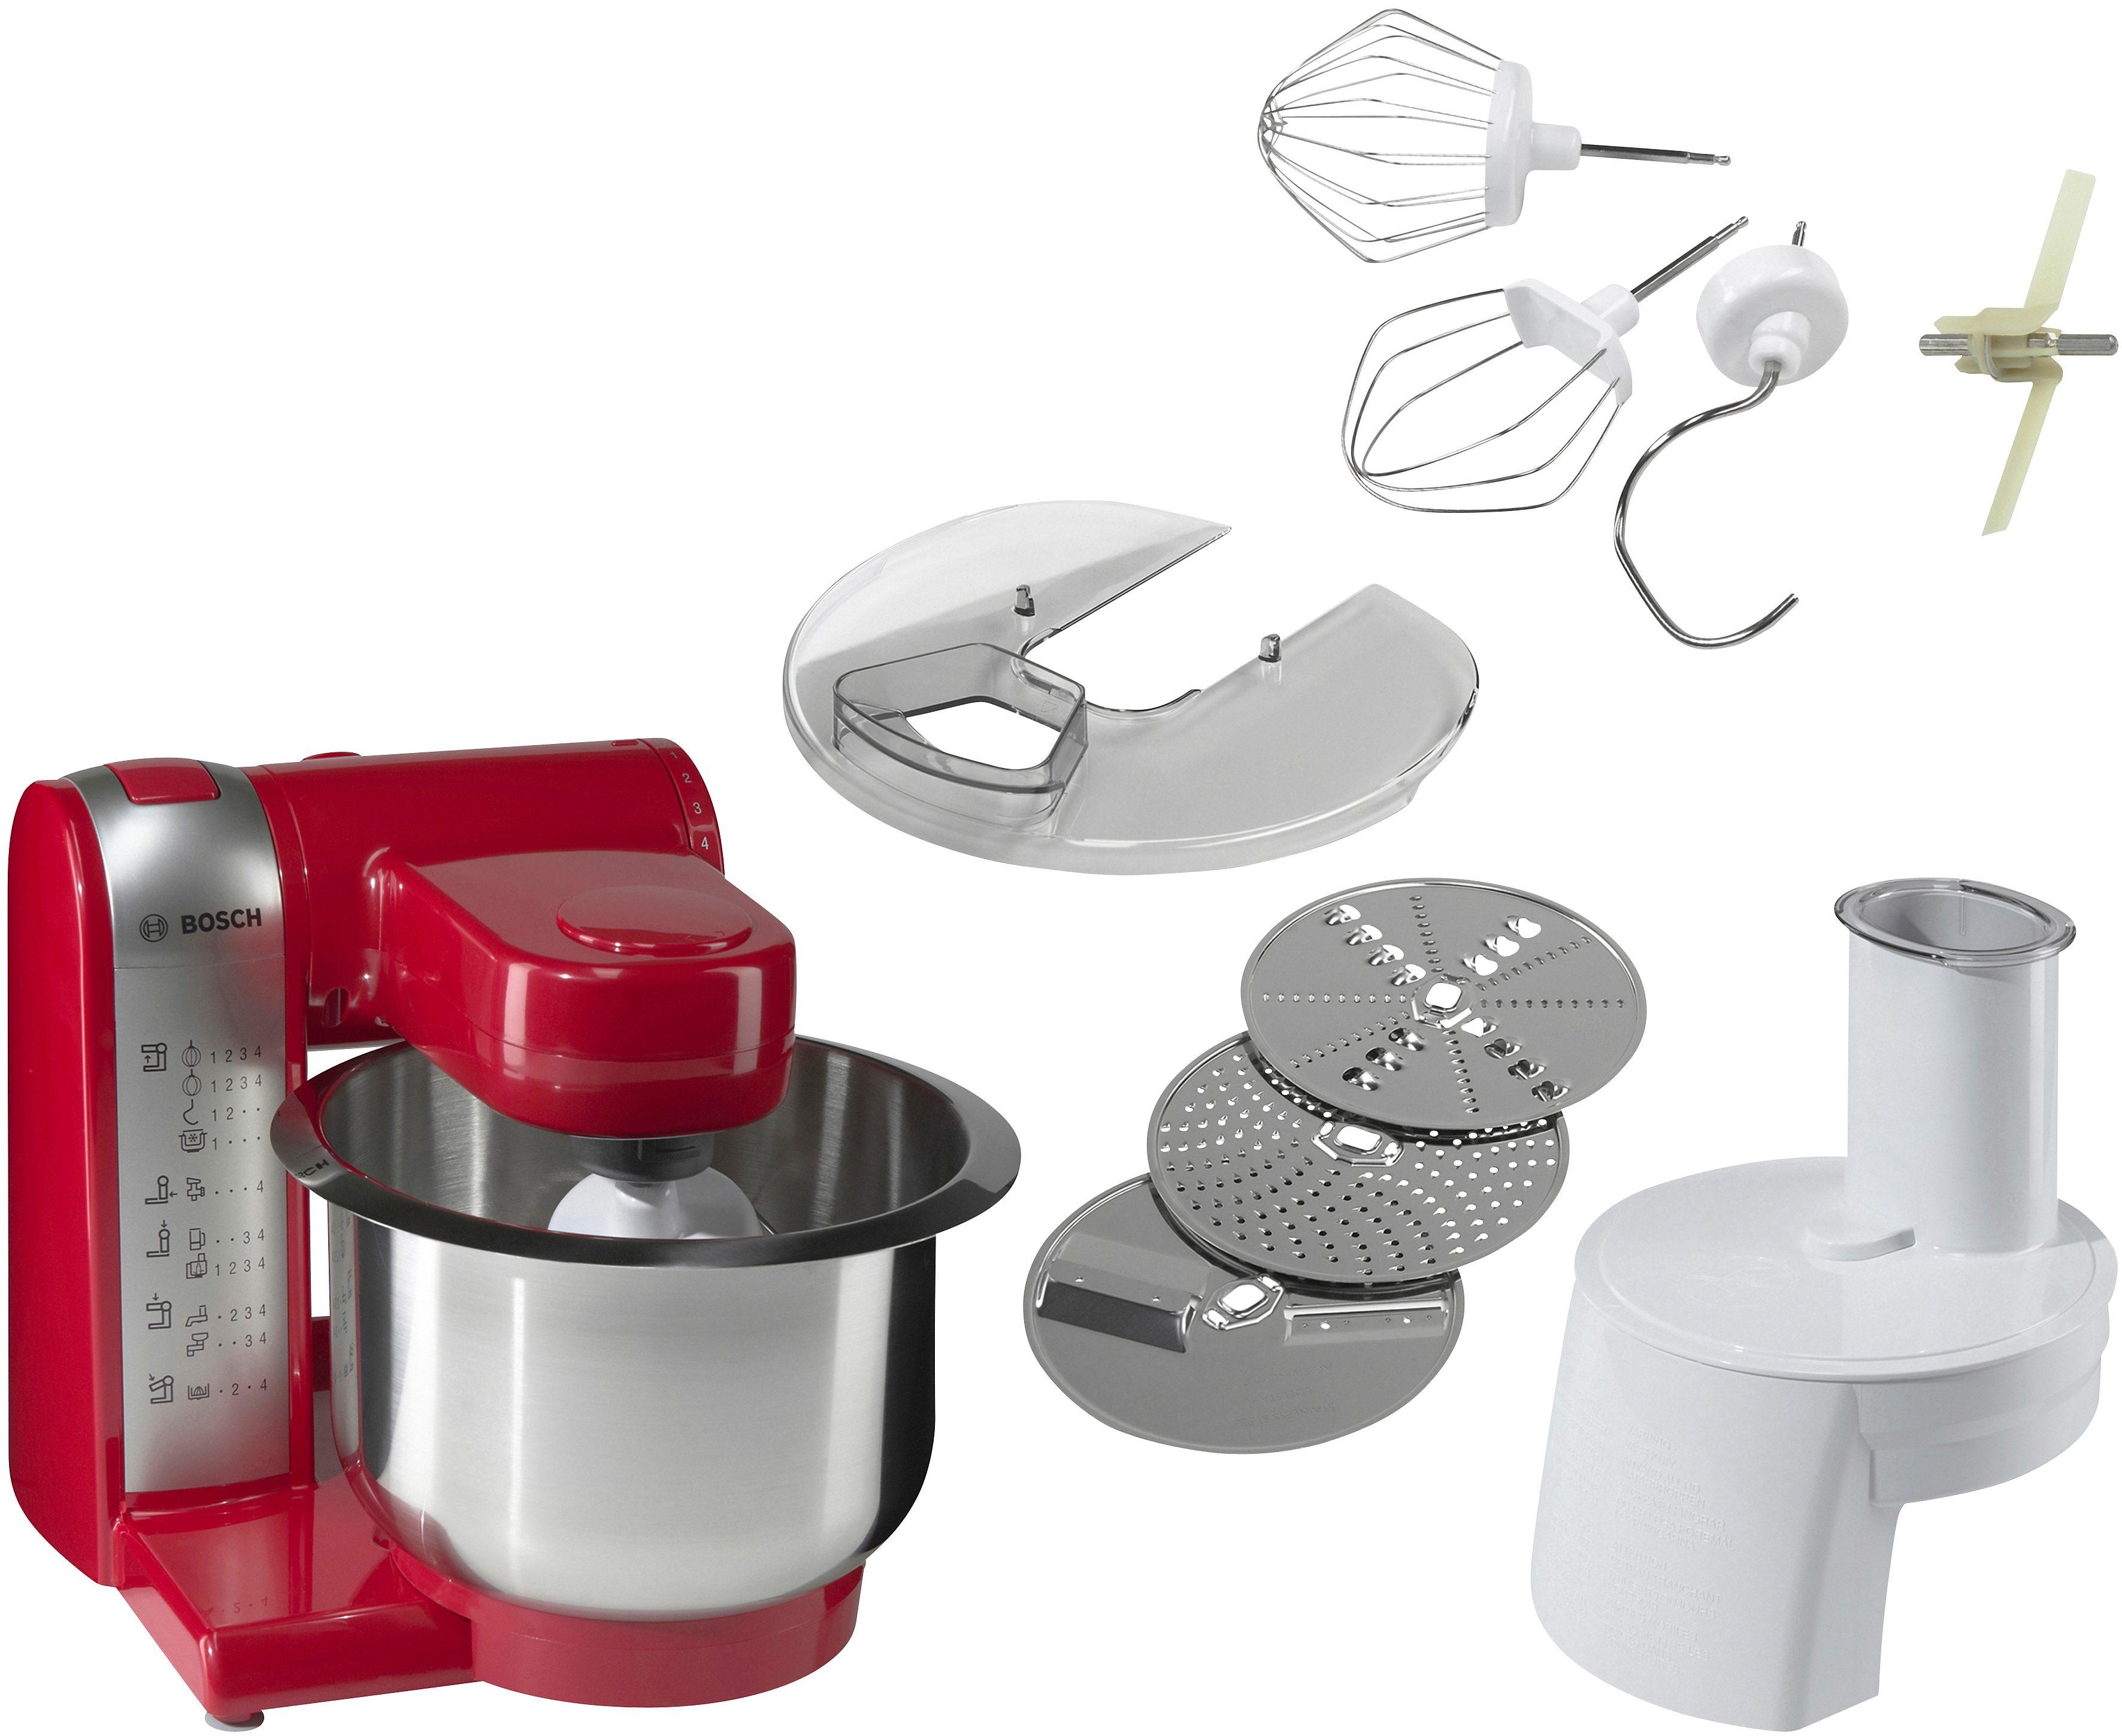 MUM 7... Bosch Rührbesen für Rührschüssel zu Küchenmaschinen MUM 6..